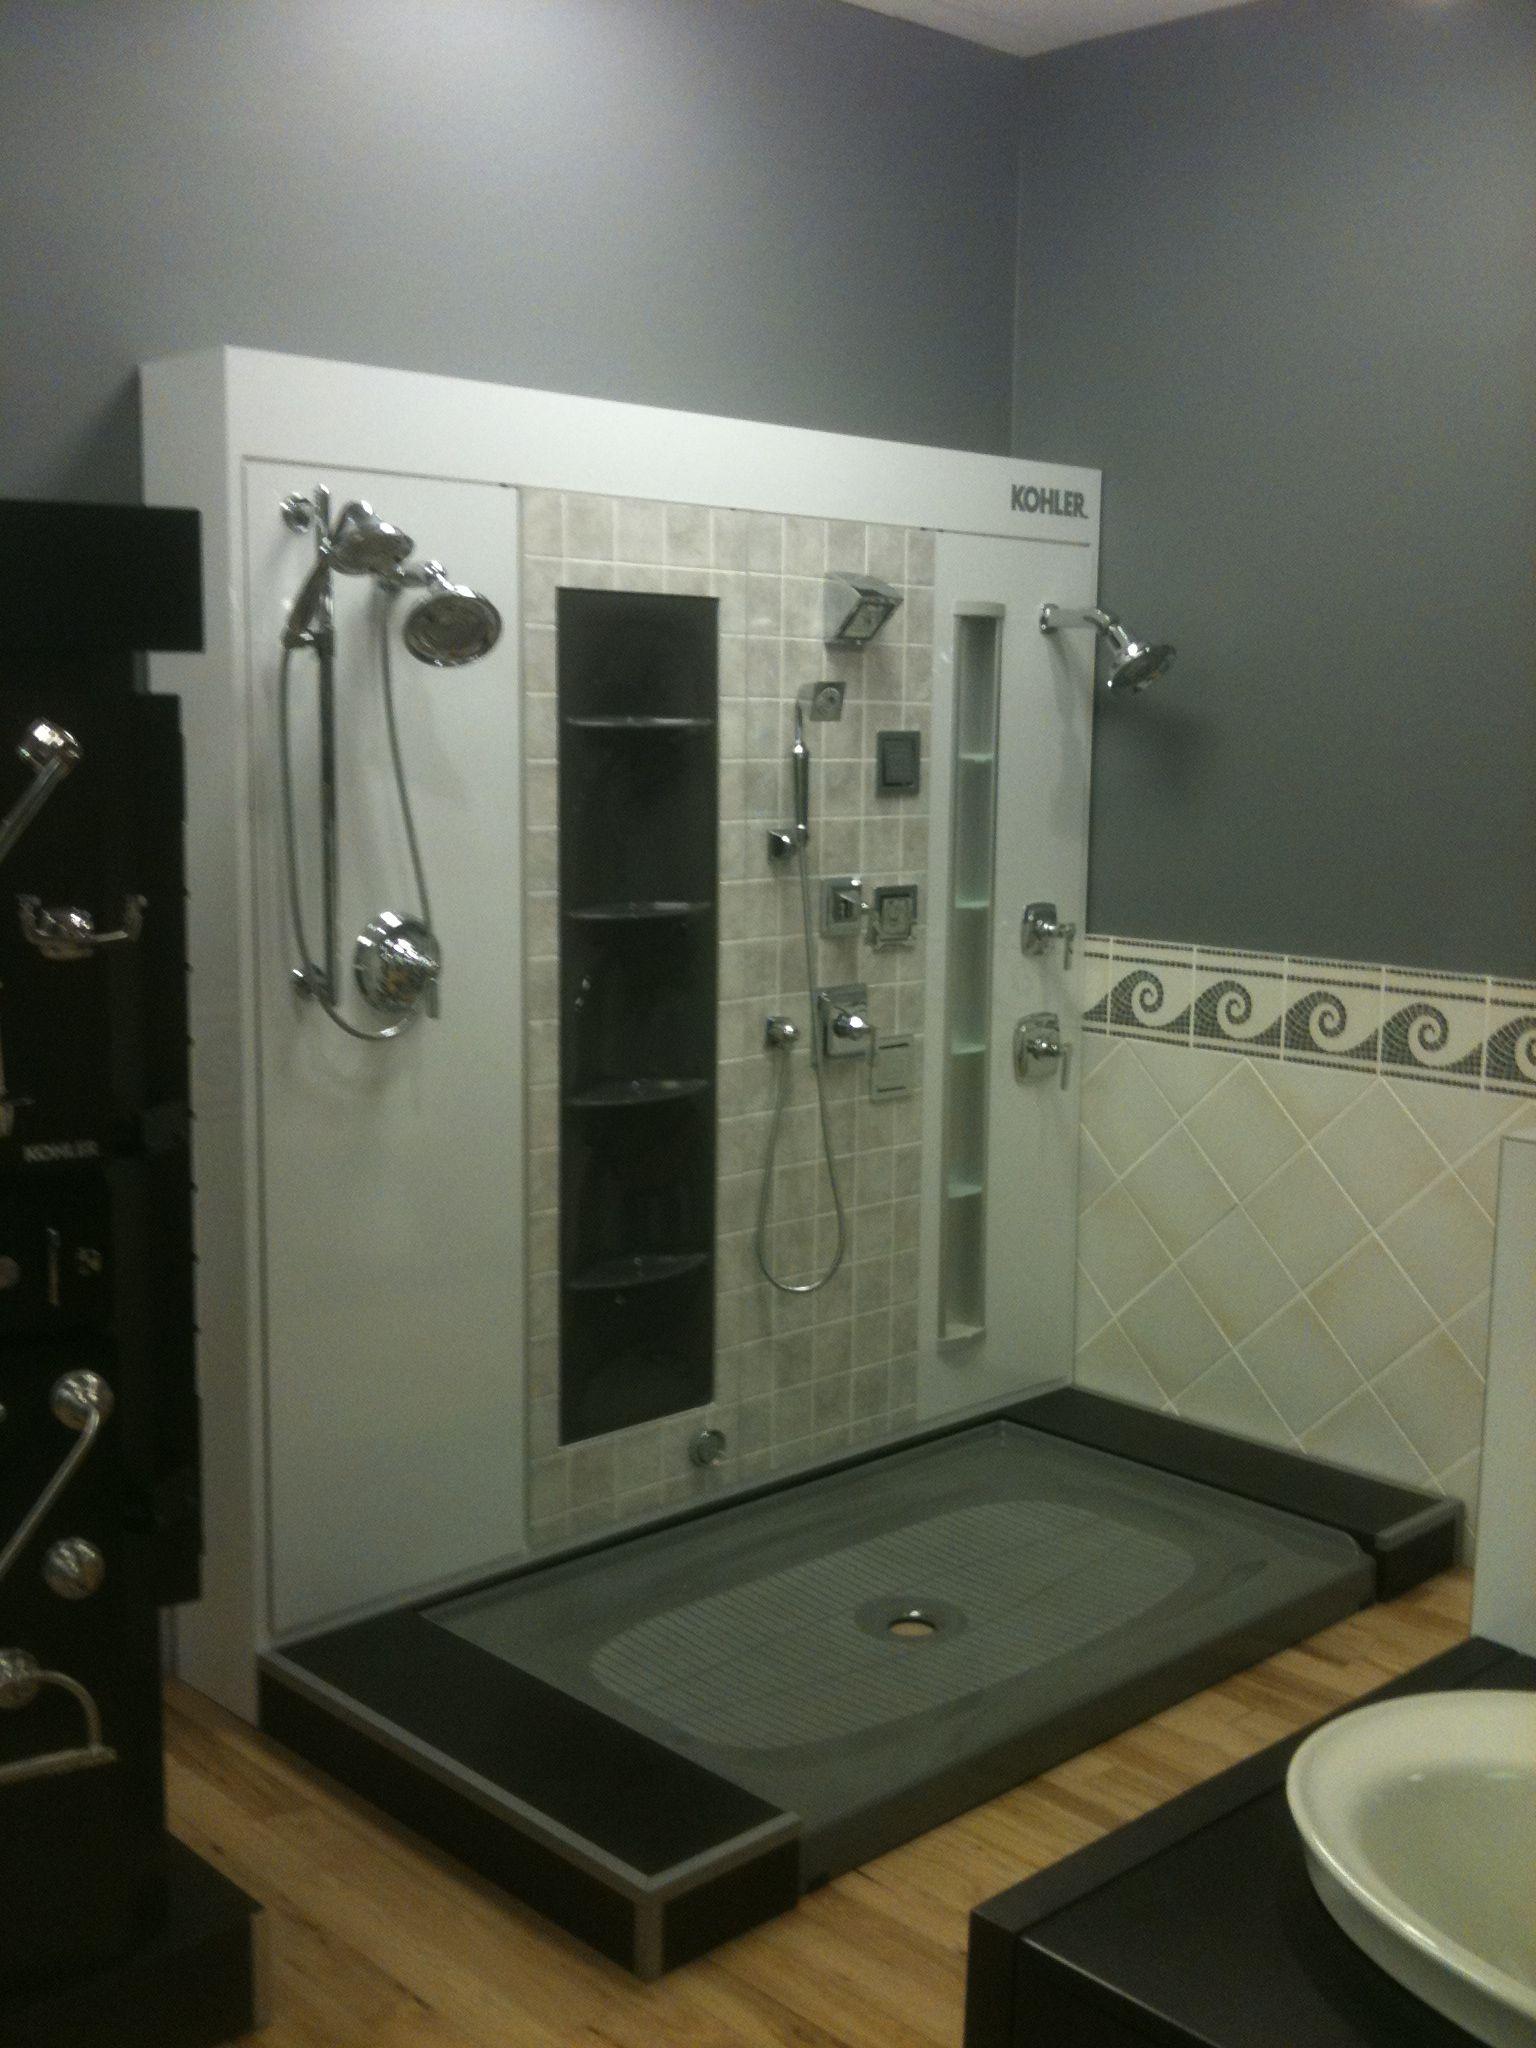 Kohler Shower Display | Our Denver Showroom | Pinterest